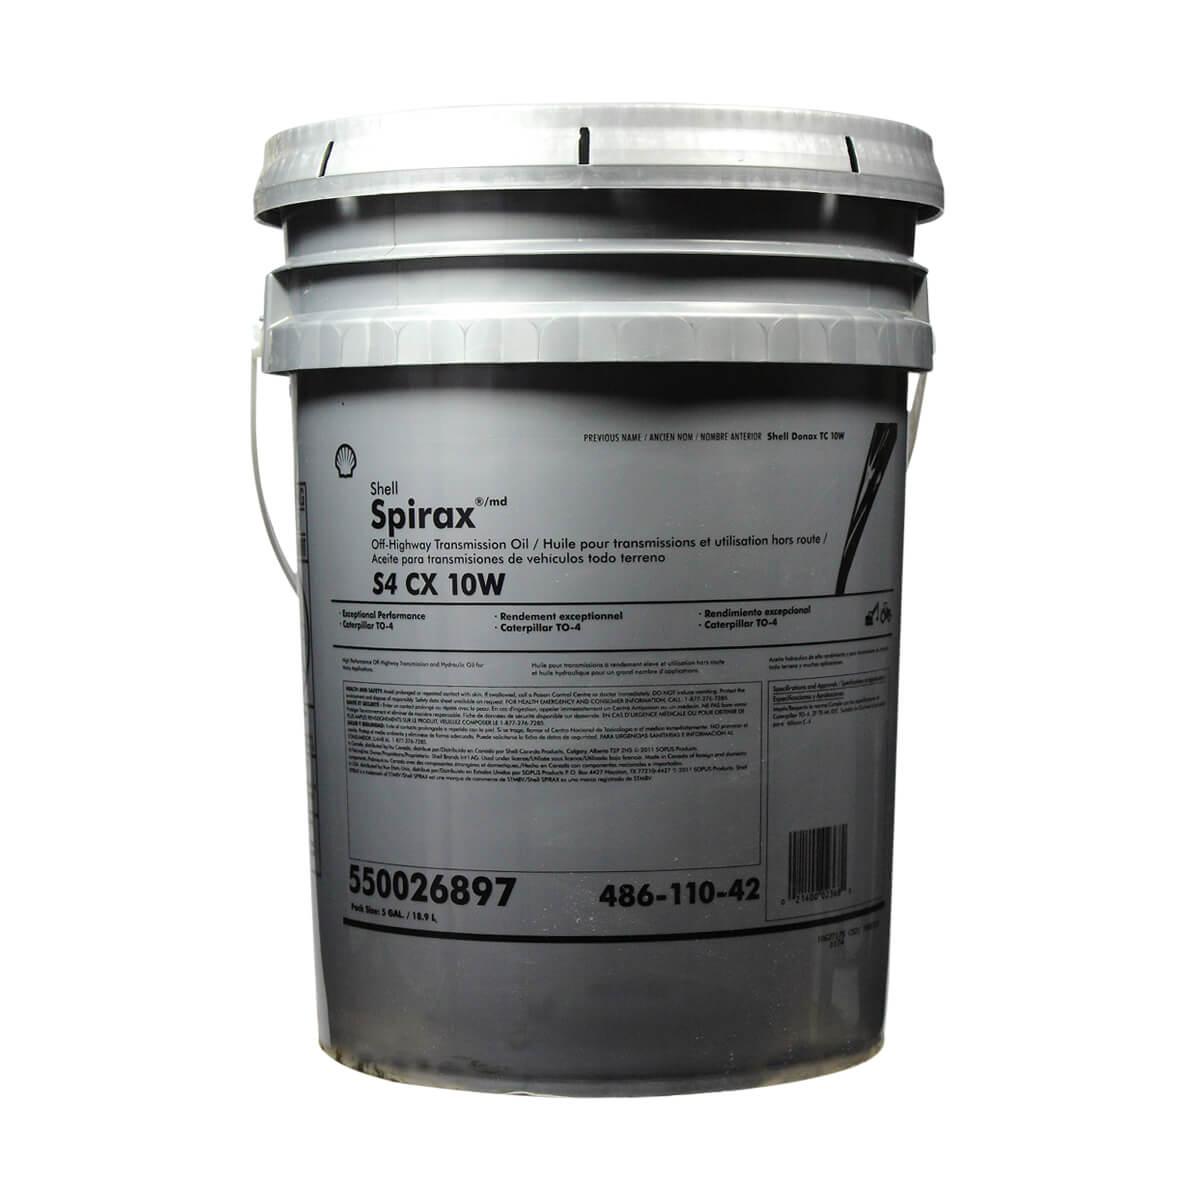 Shell Spirax S4 CX 10W - 18.9 litre